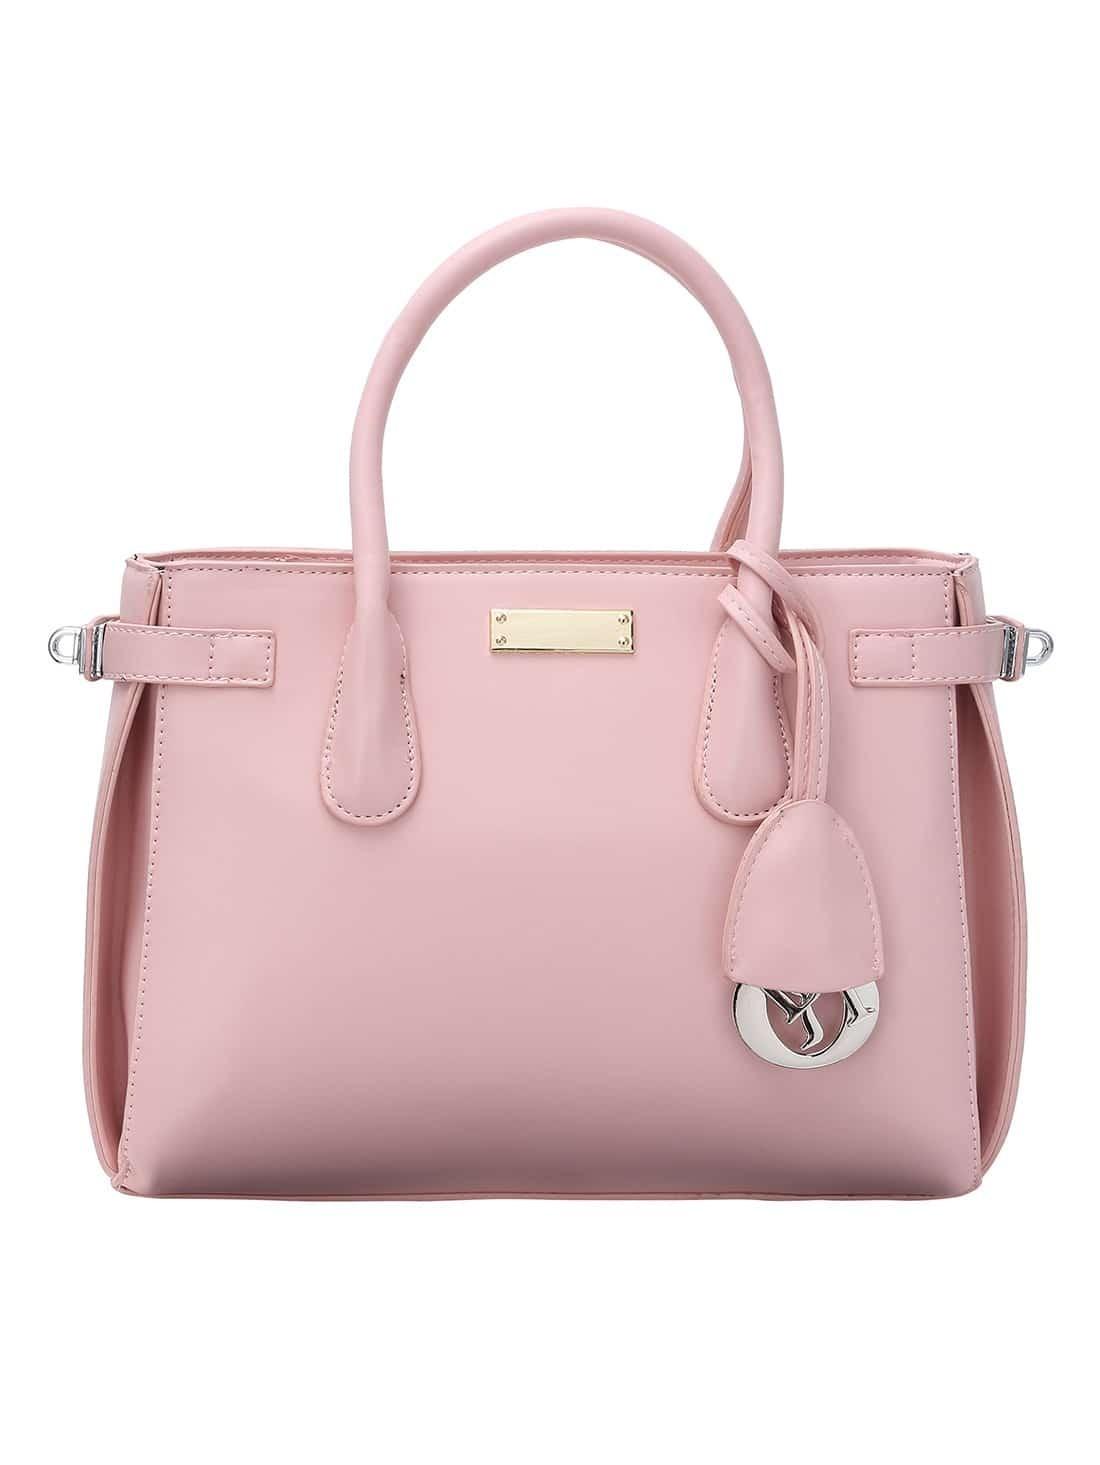 top zip side turn lock pink double tote bag. Black Bedroom Furniture Sets. Home Design Ideas